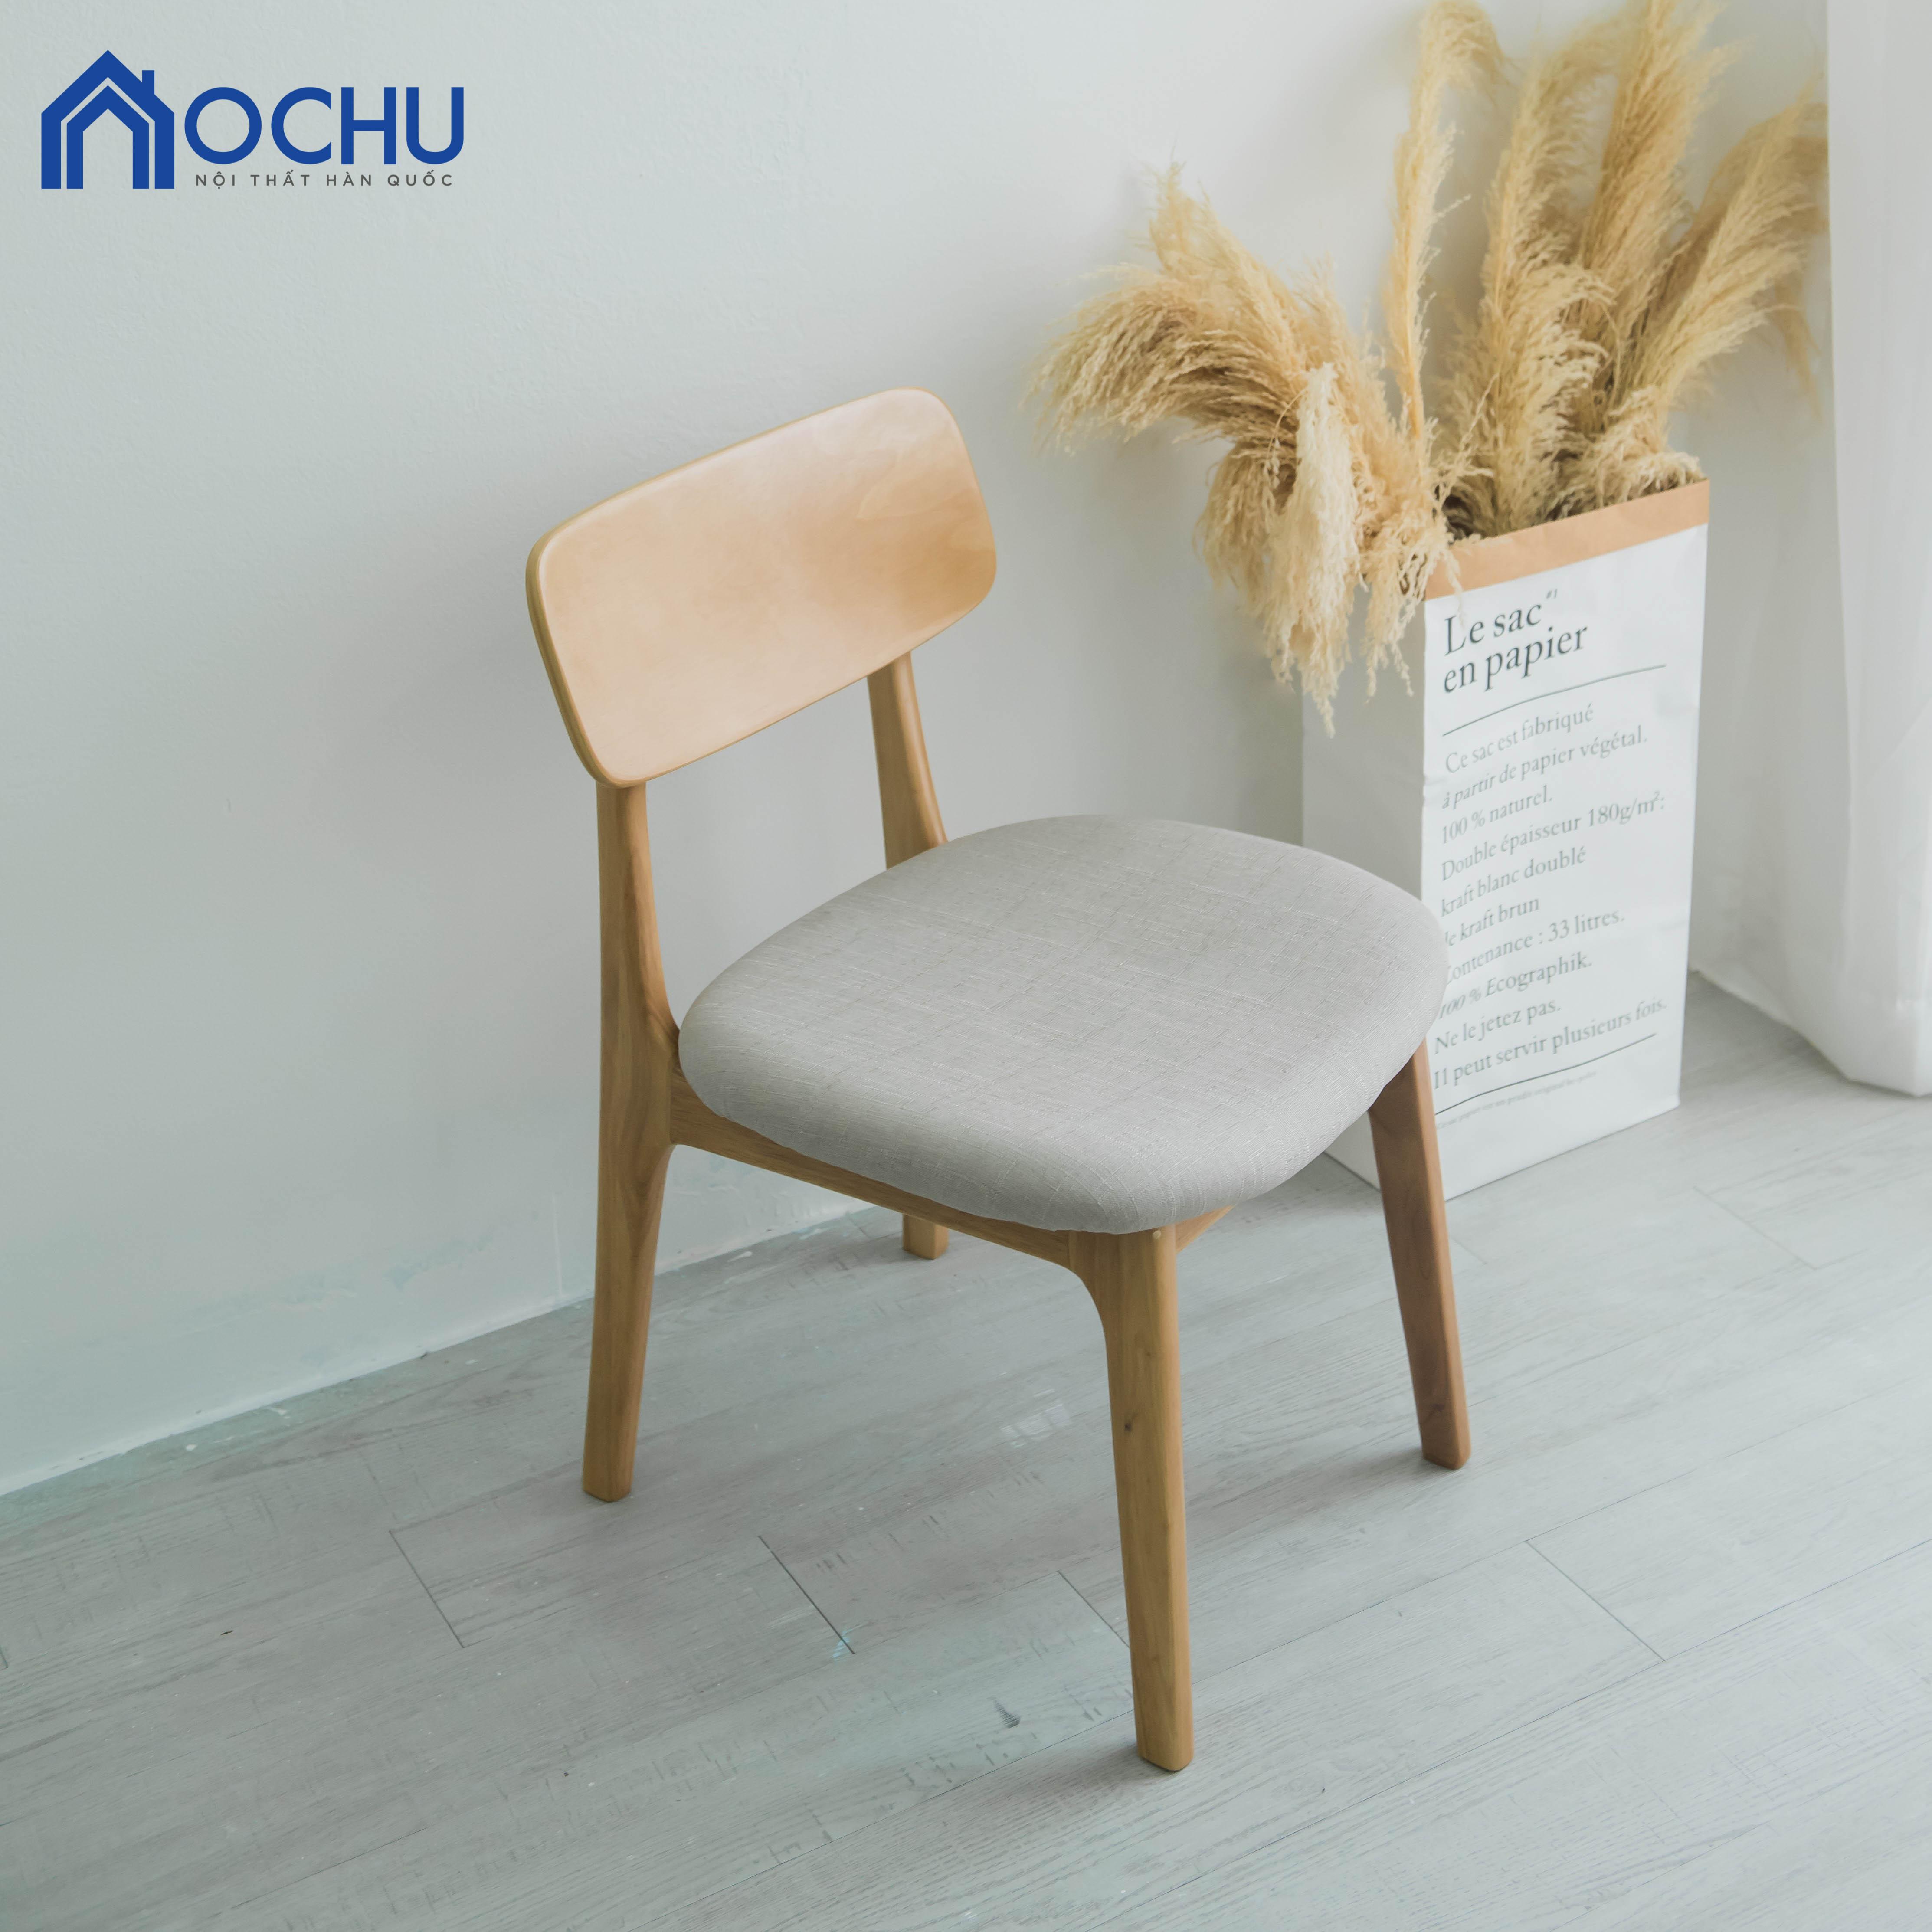 Ghế Ăn Gỗ Cao Su OCHU - Iamar Chair S - Natural